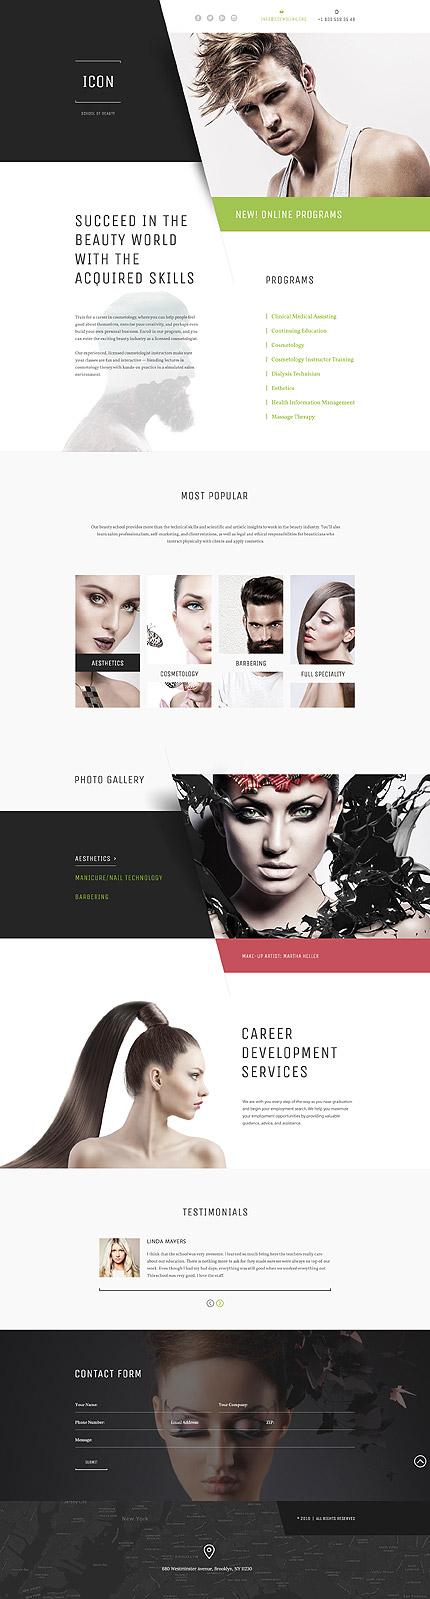 Website Template #58405